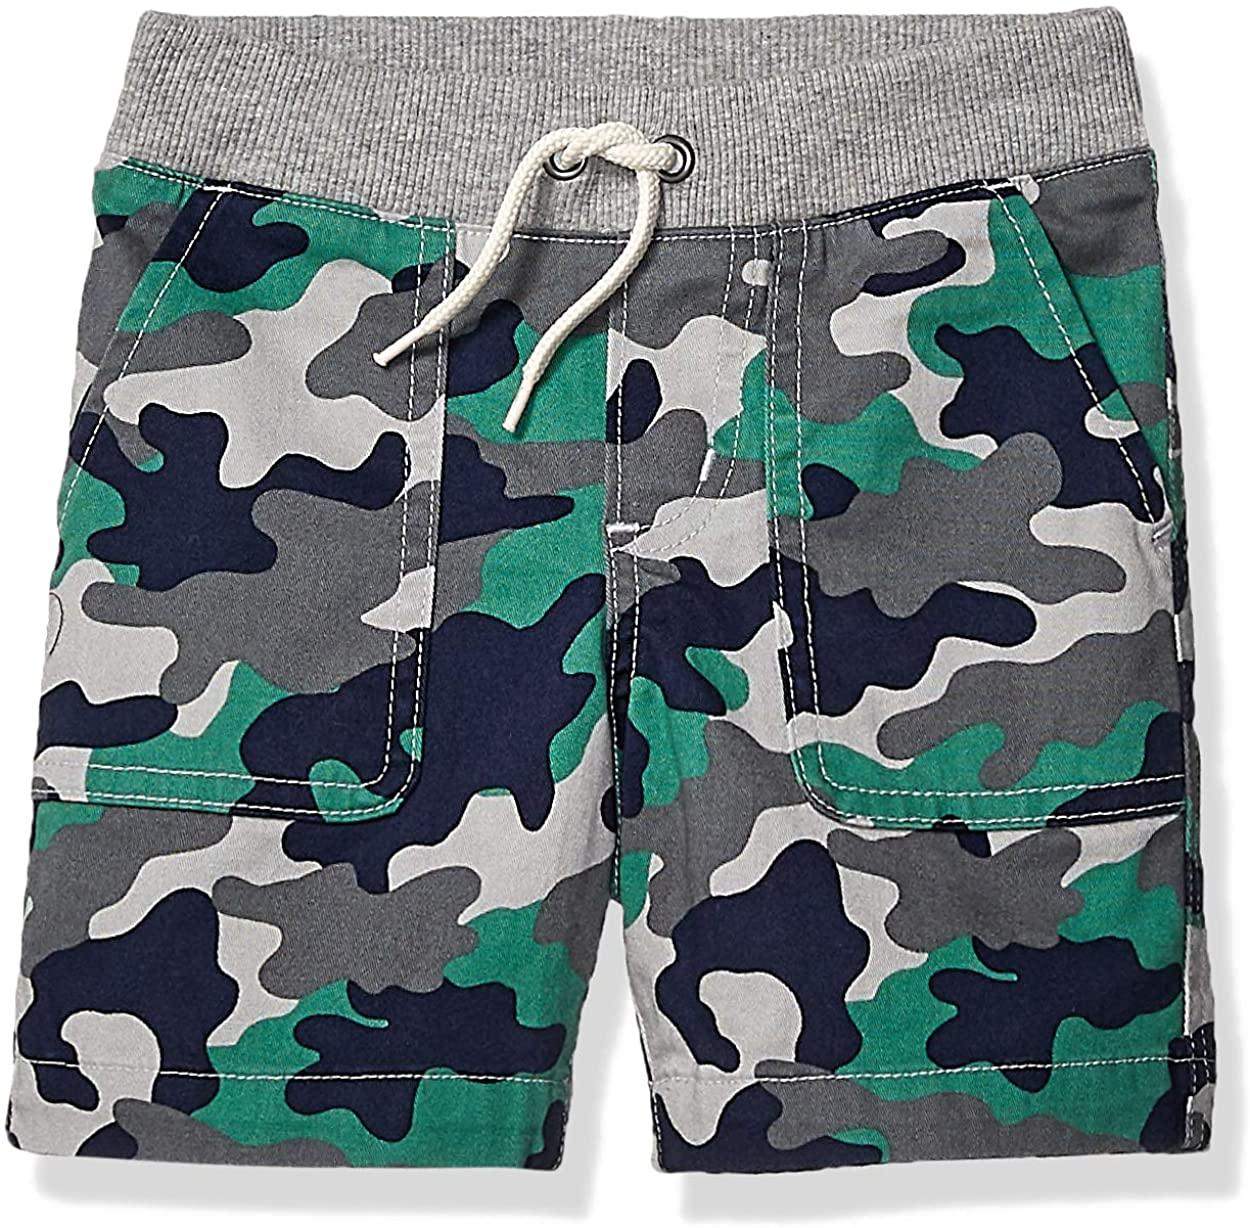 DHgate Brand - Spotted Zebra Boys Pull-On Shorts